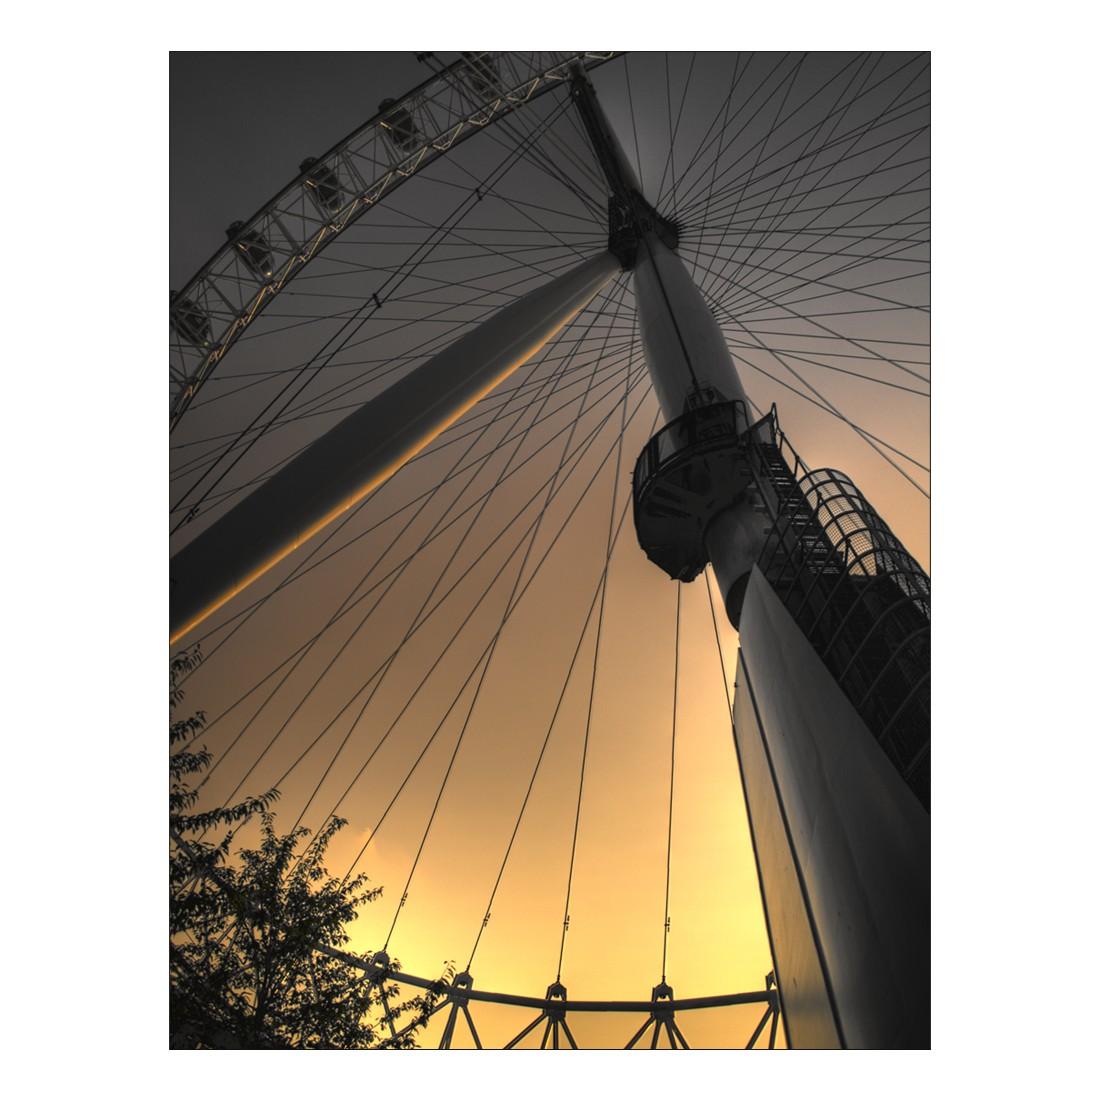 Leinwandbild London Eye – 100 x 75cm – Abmessung – 100 x 75cm, Gallery of Innovative Art online bestellen